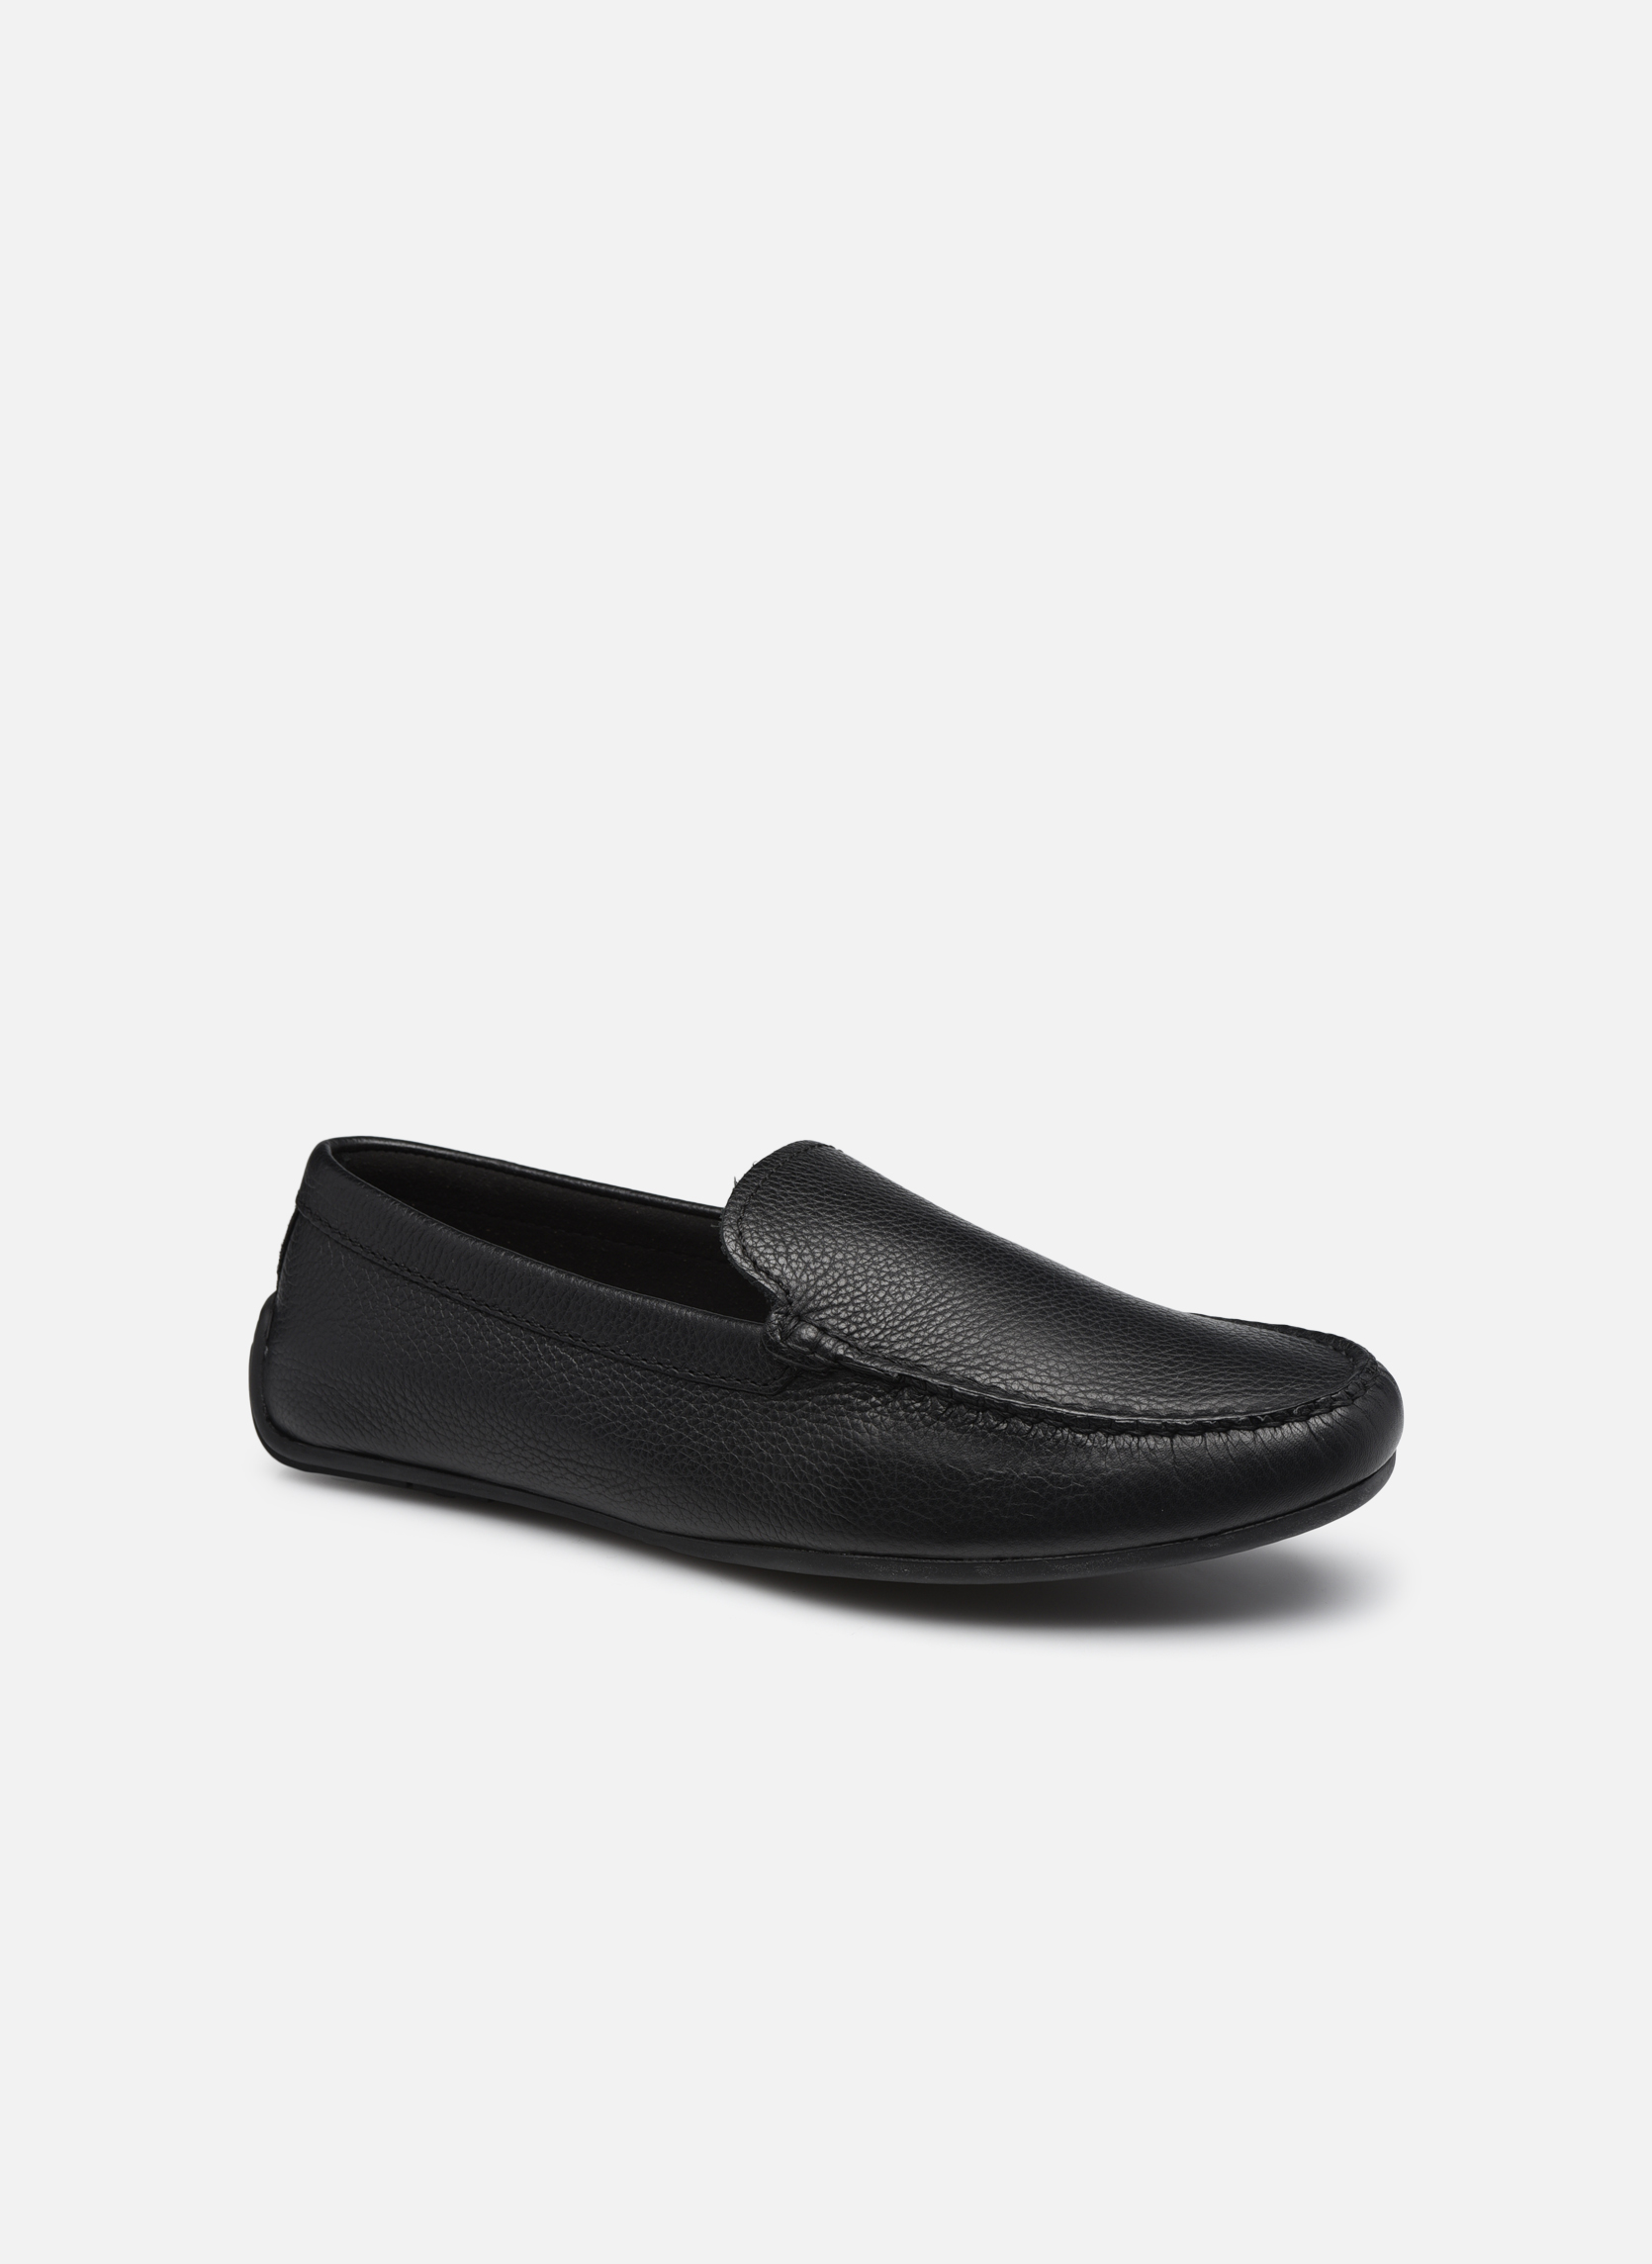 Loafers Mænd Reazor Edge